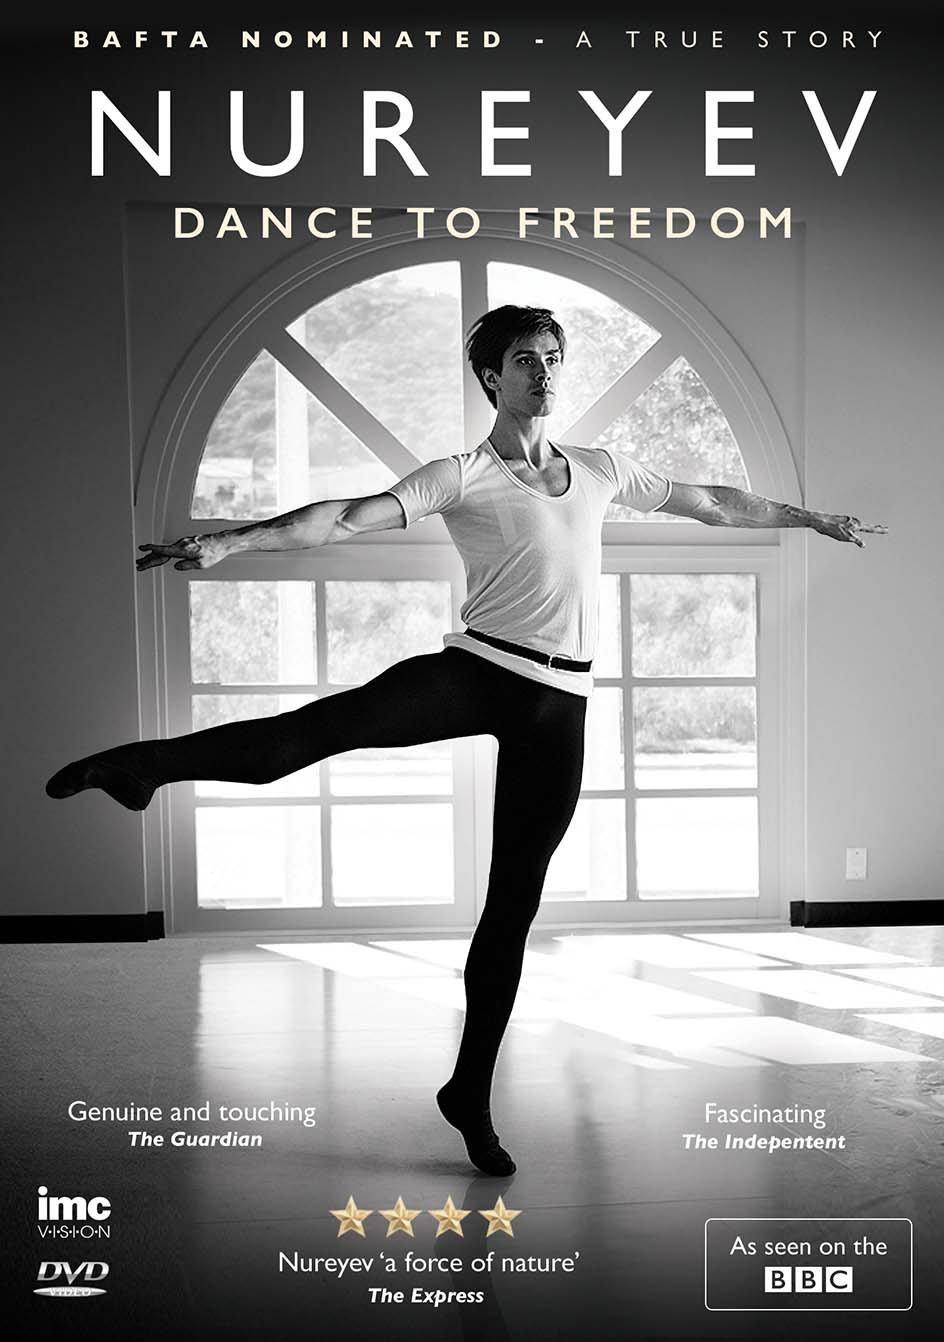 Nureyev Dance To Freedom Based On A True Story Bafta